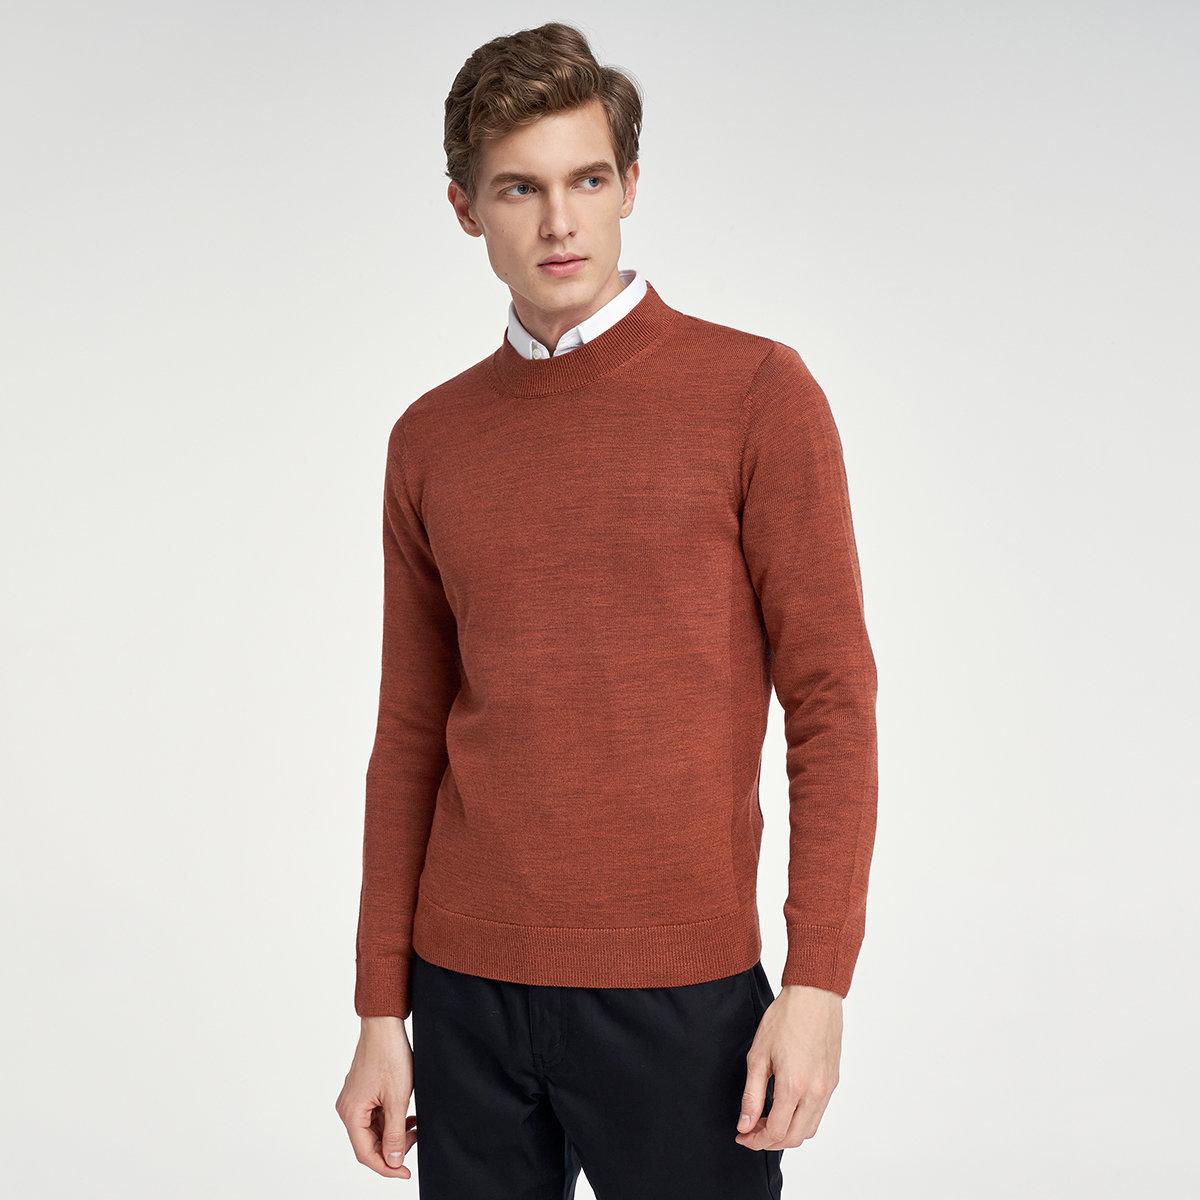 MEN'S SWEATER(brown)